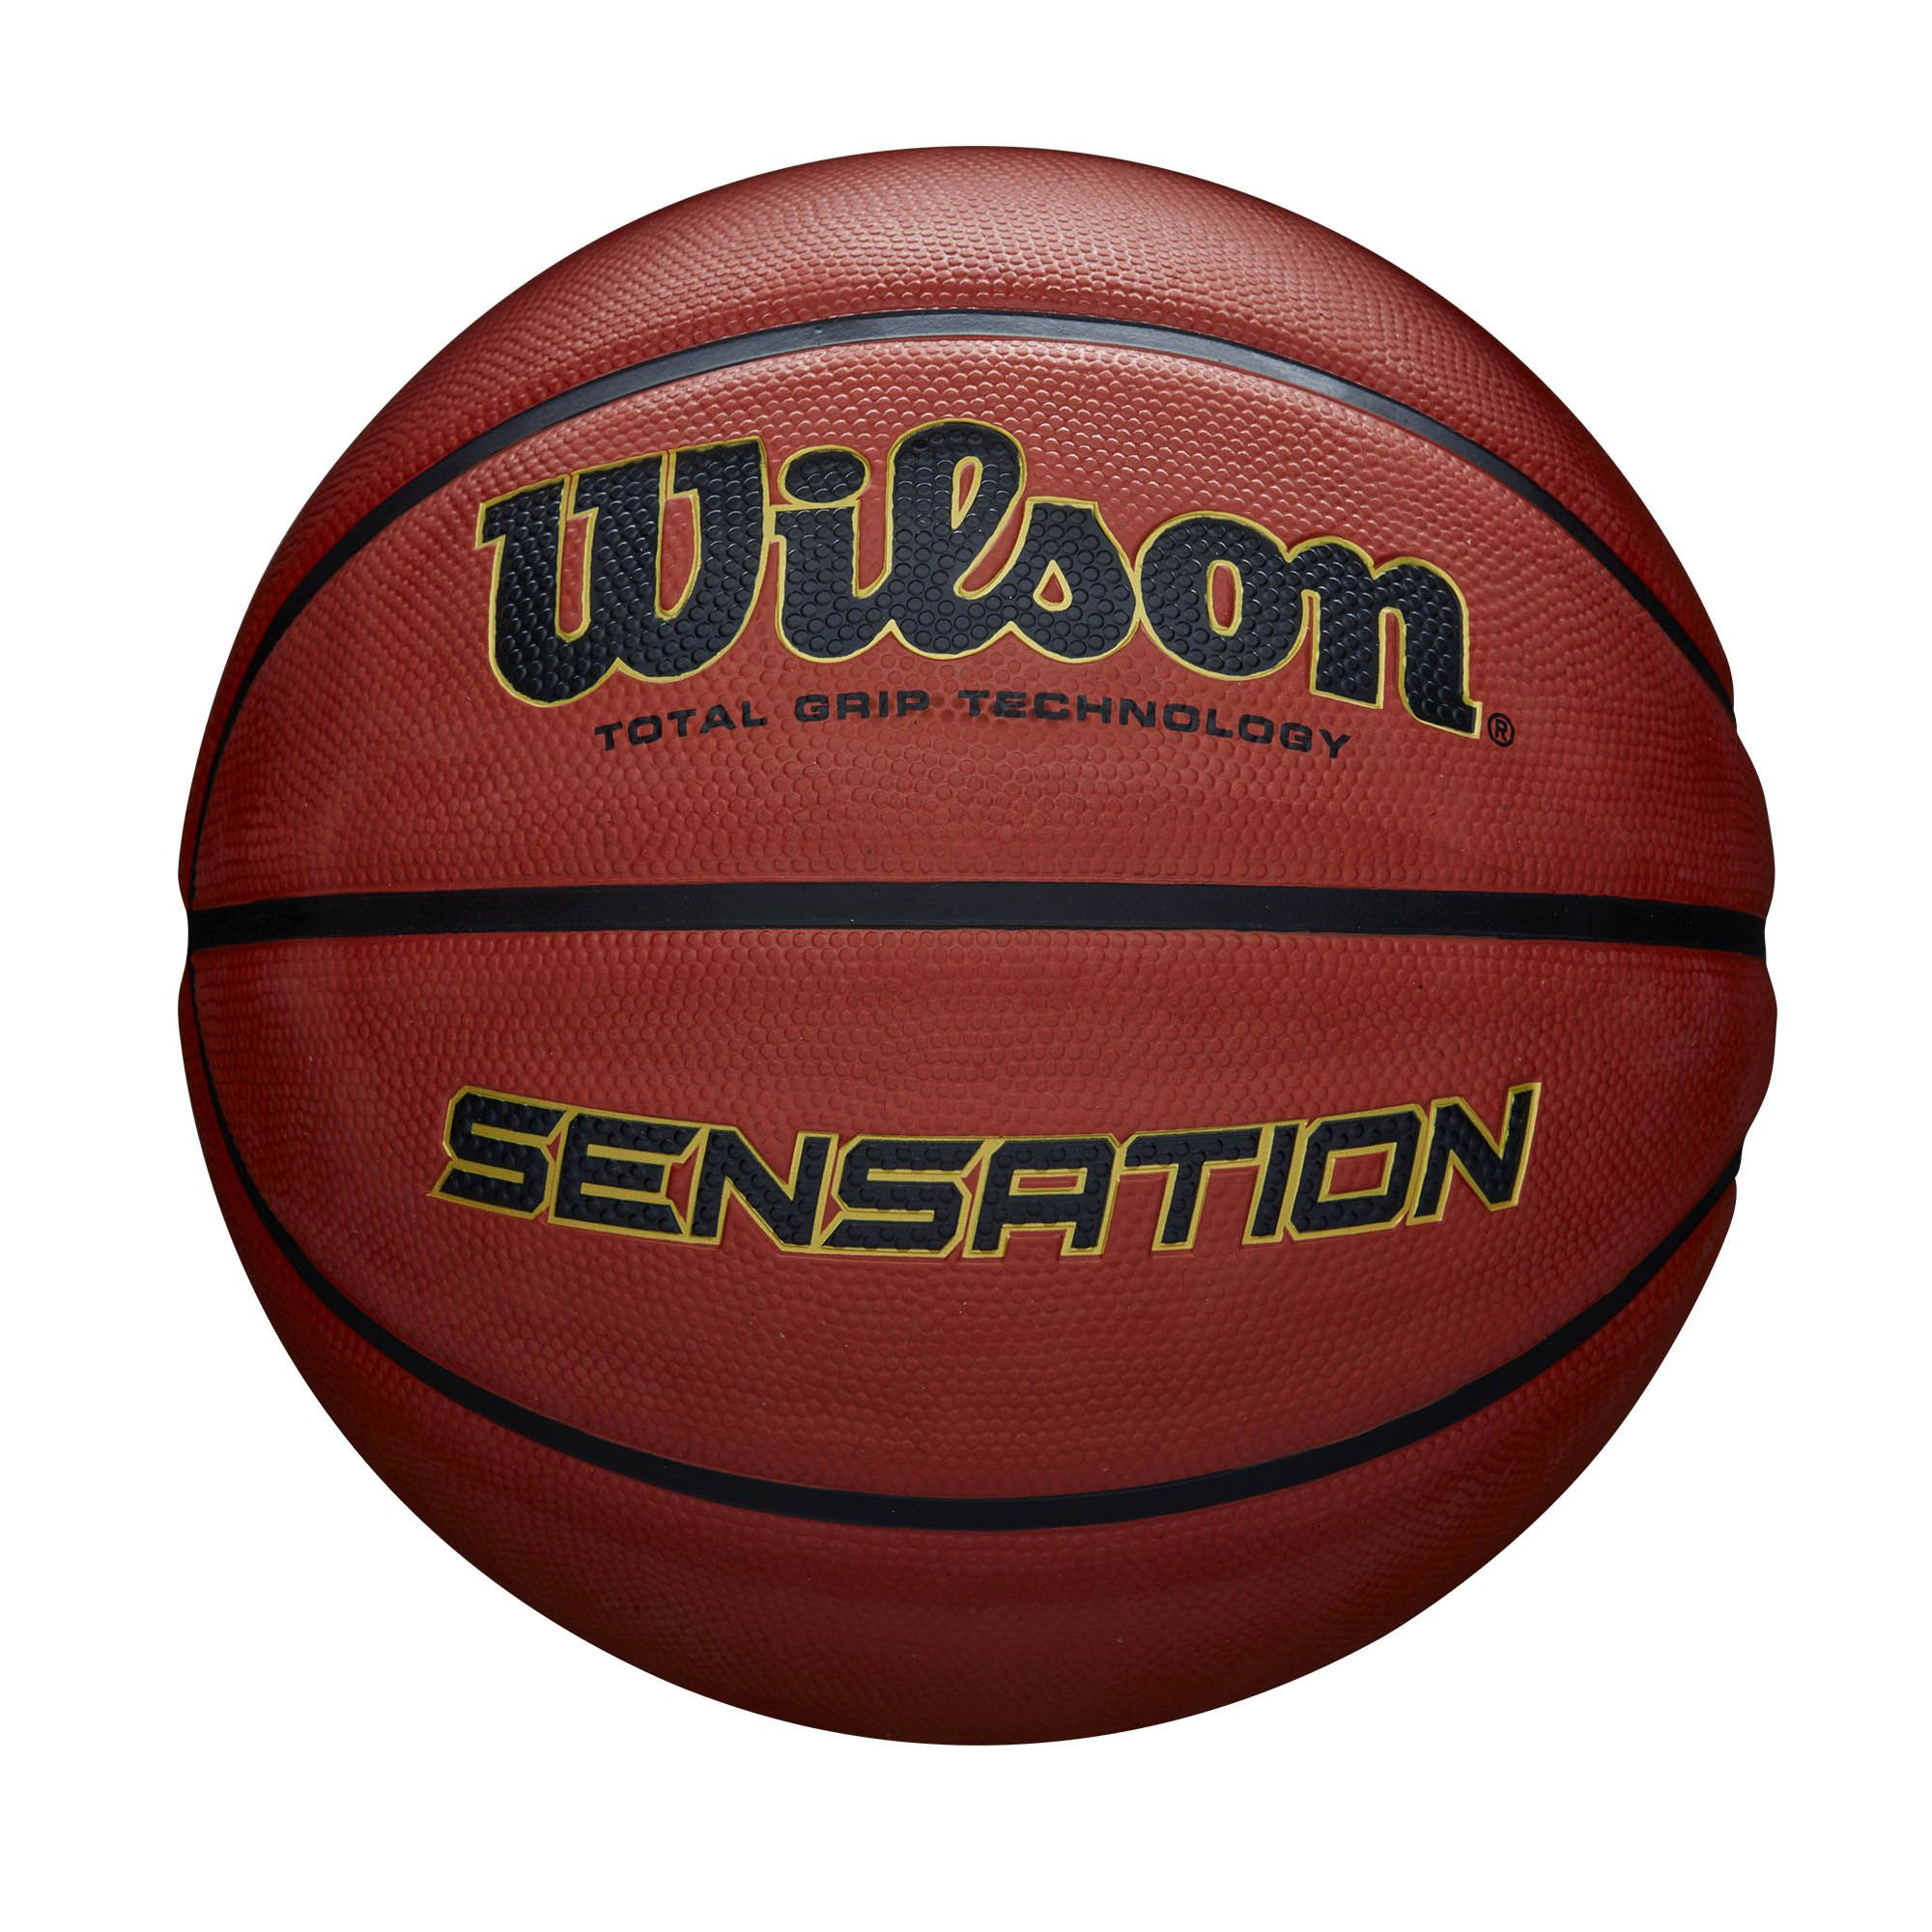 Size 5-7 Wilson Sensation Basketball Ball